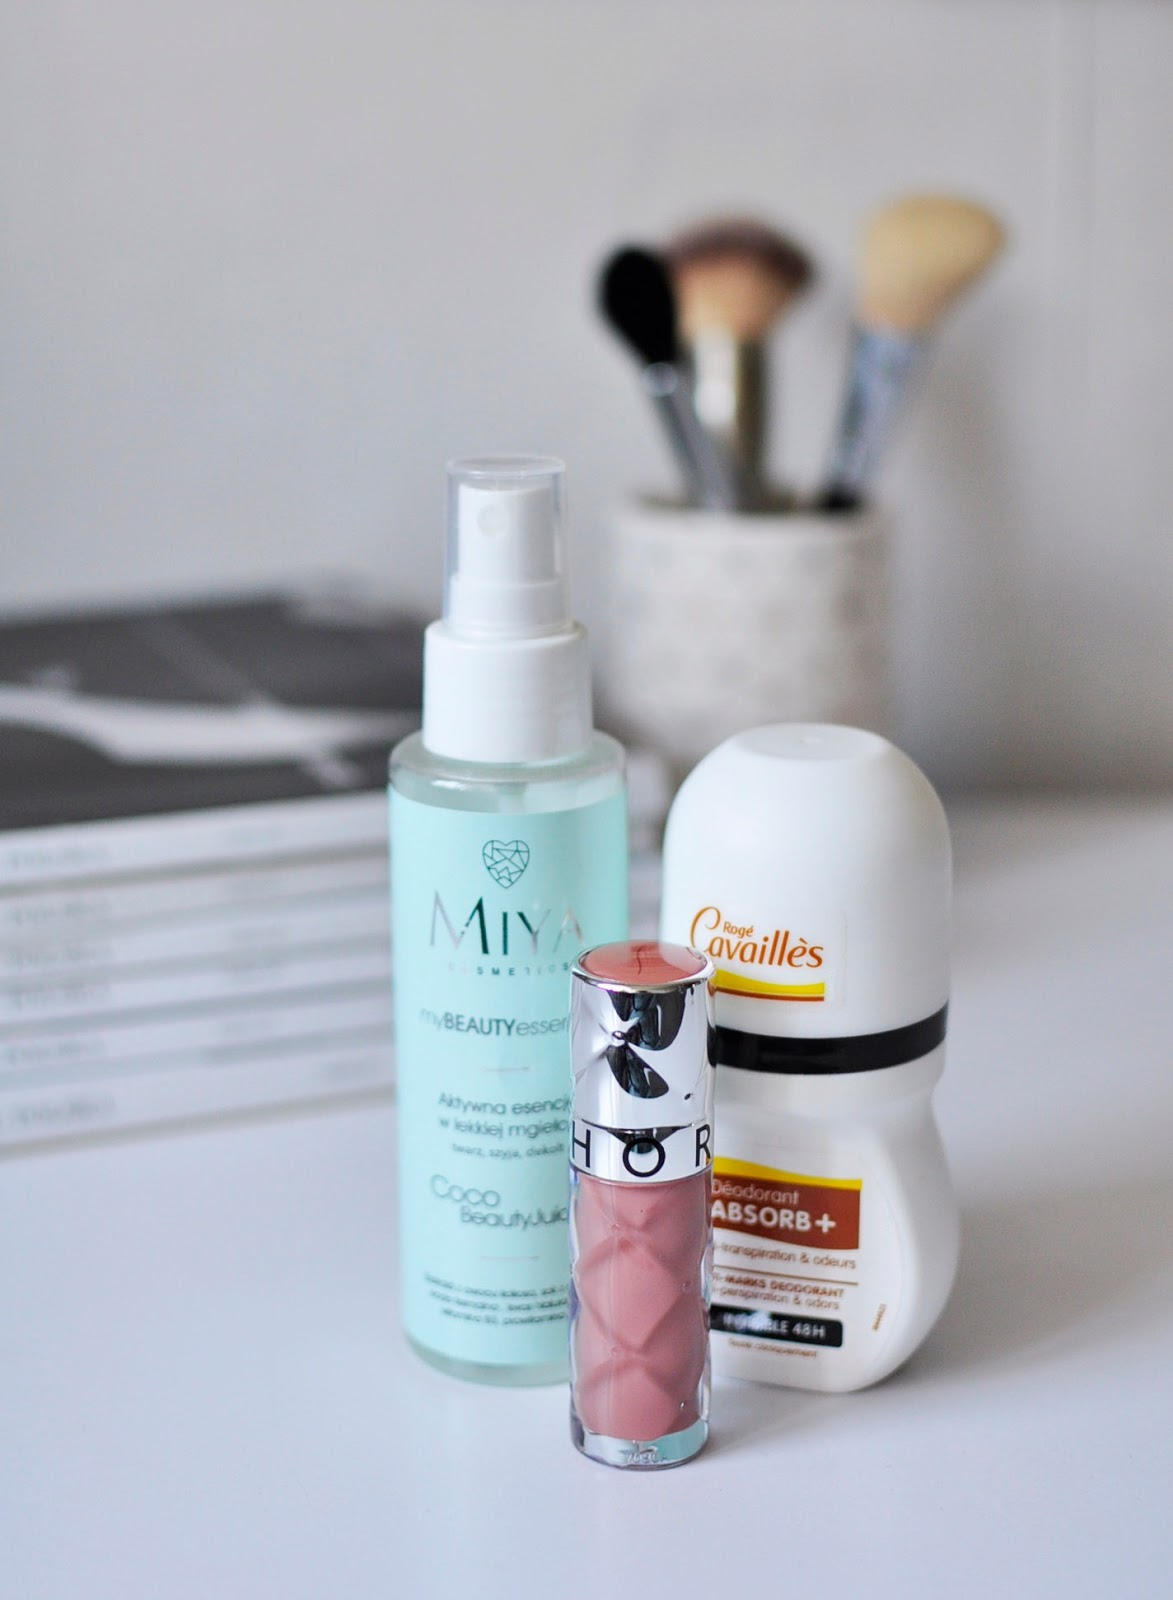 Ulubieńcy #sierpnia | MIYA Cosmetics  Roge Cavailles Sephora